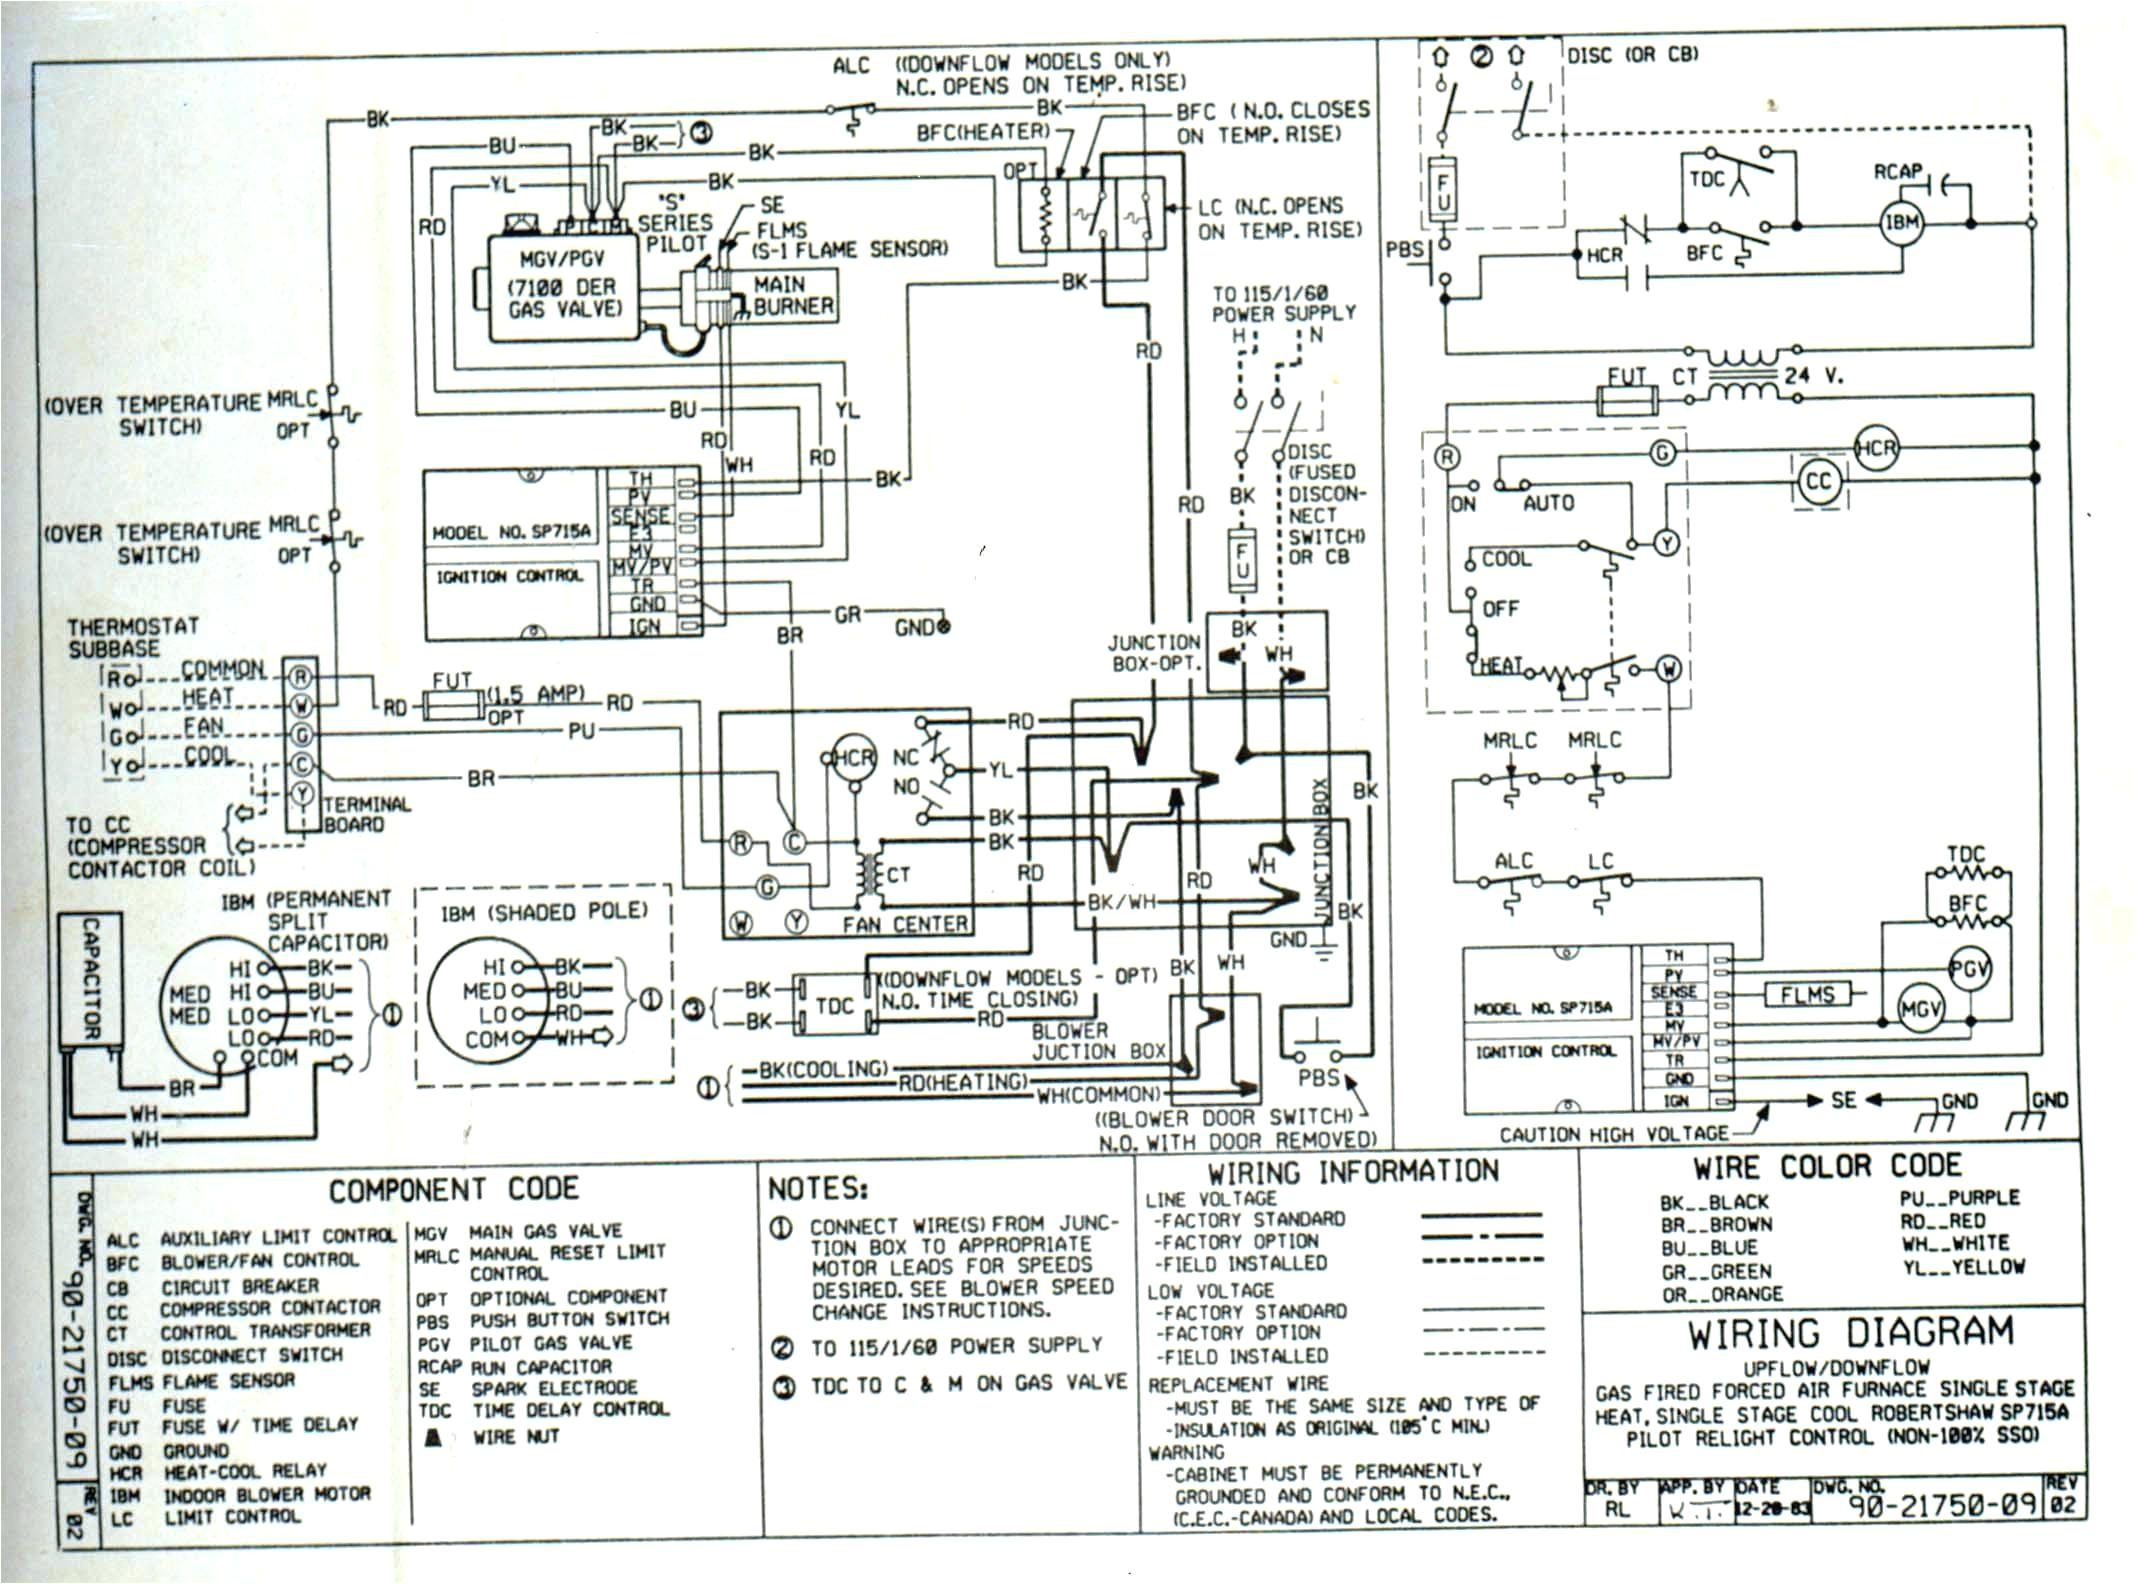 trane xe80 wiring diagram wiring diagram insider trane xe80 wiring diagram wiring diagram datasource trane xe80